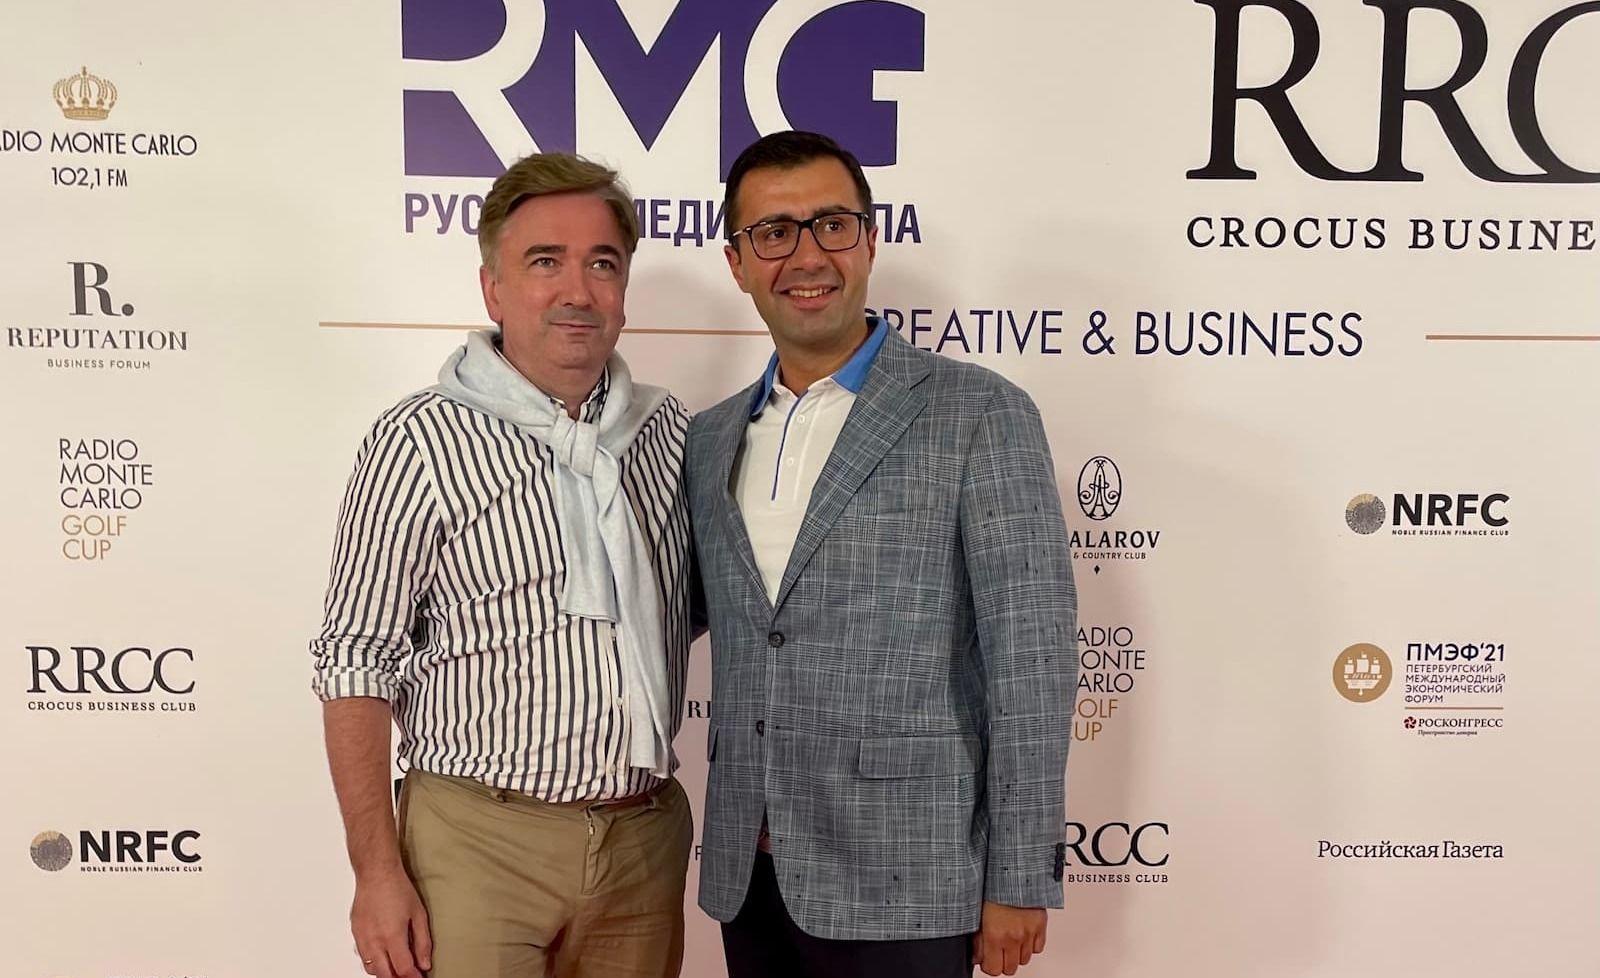 Михаил Трубецкой и Евгений Коровин на форуме Creative & Business